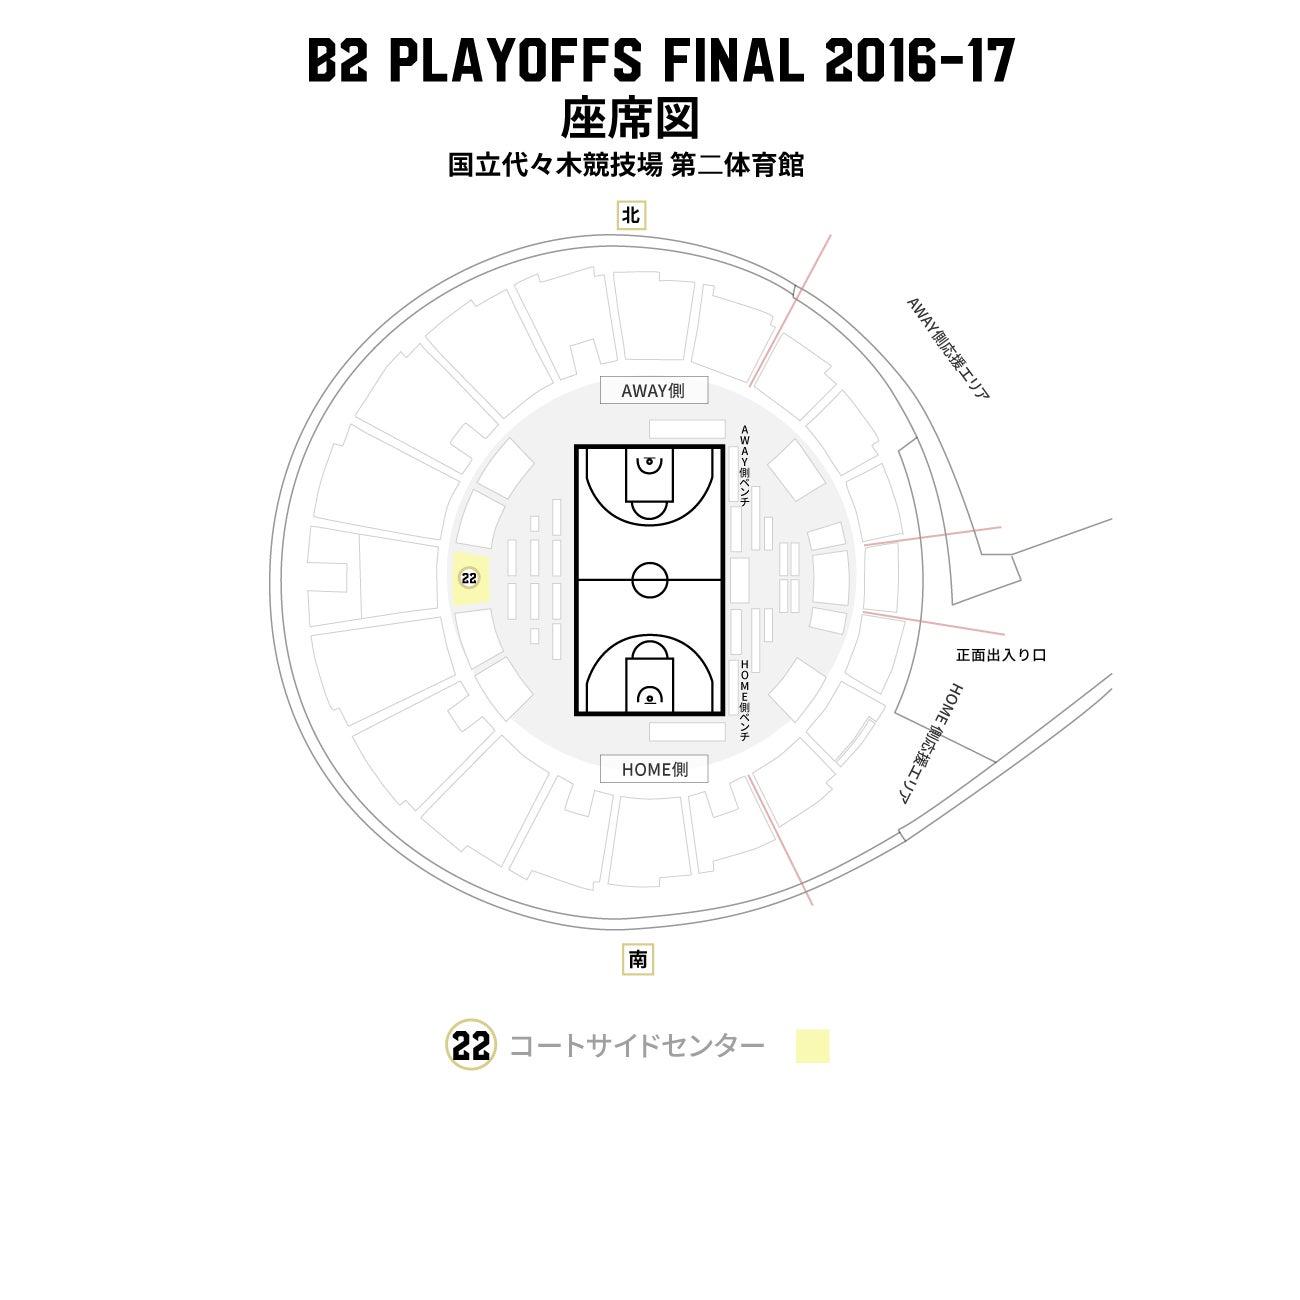 seatview_b2final_seat_22.jpg